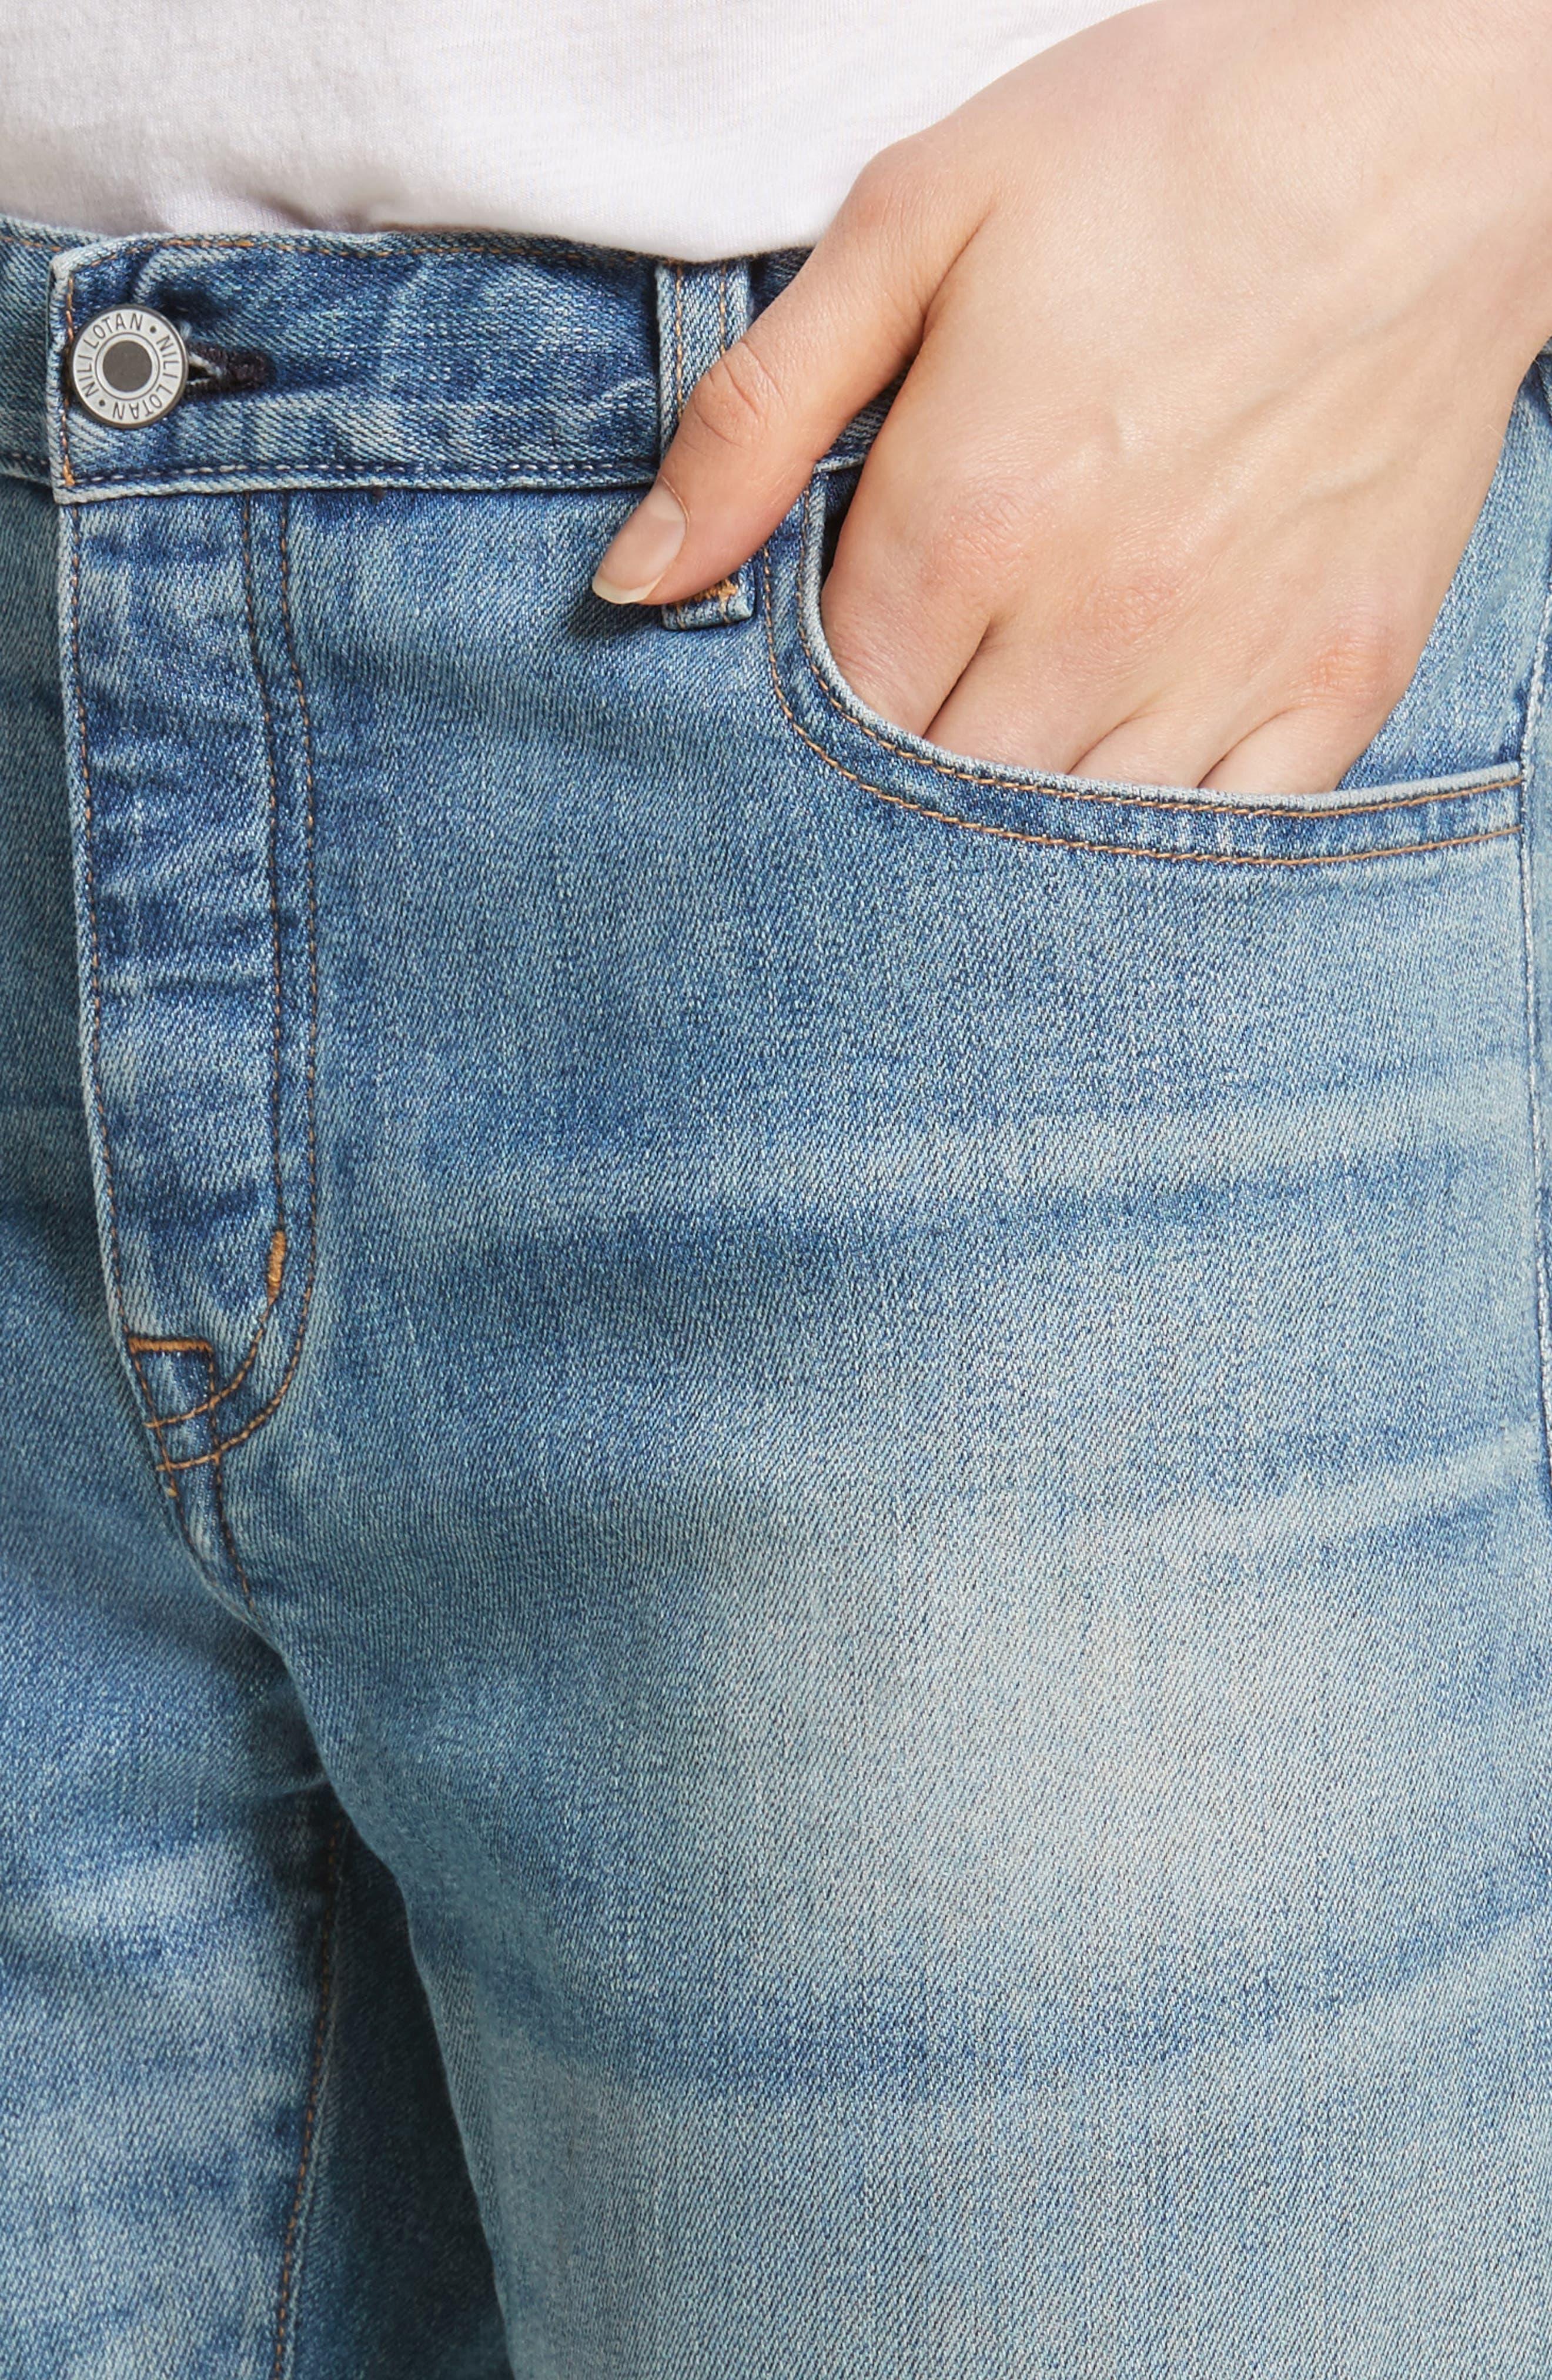 NILI LOTAN,                             Raw Edge Crop Boyfriend Jeans,                             Alternate thumbnail 4, color,                             VENICE WASH